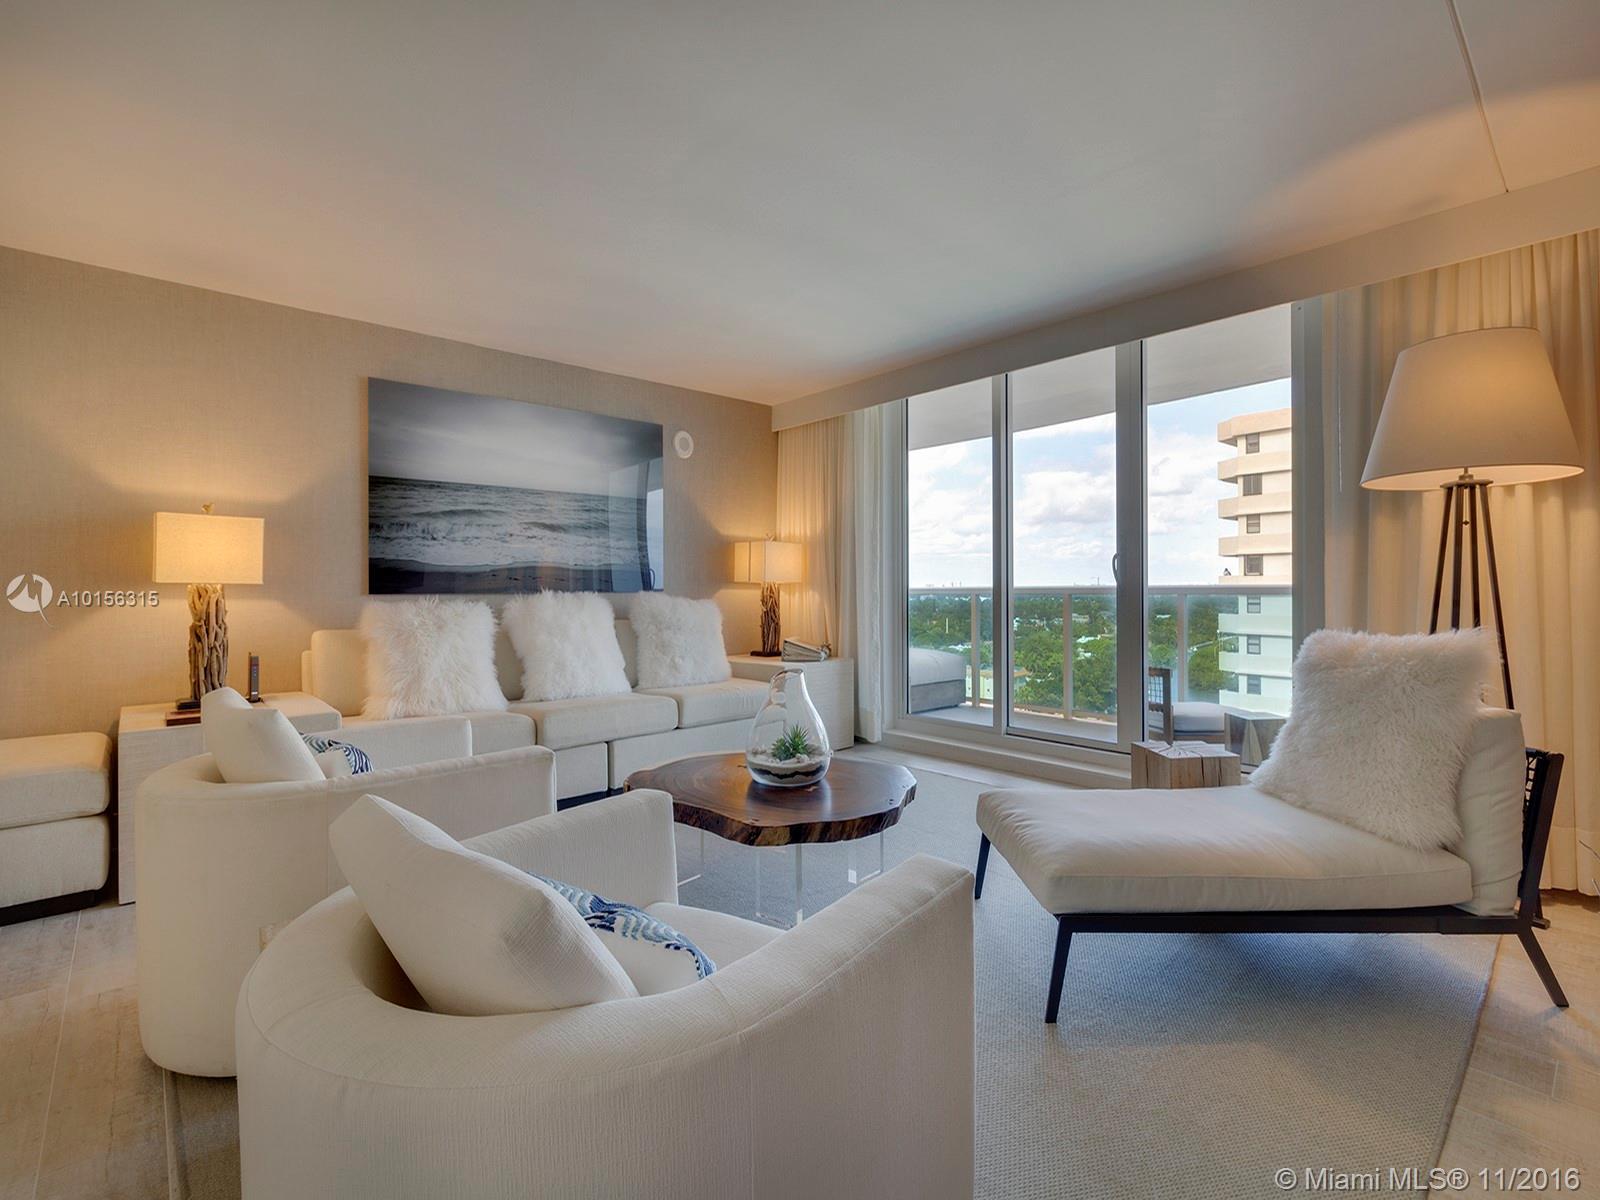 1 Hotel & Homes #1207 - 102 24 ST #1207, Miami Beach, FL 33139